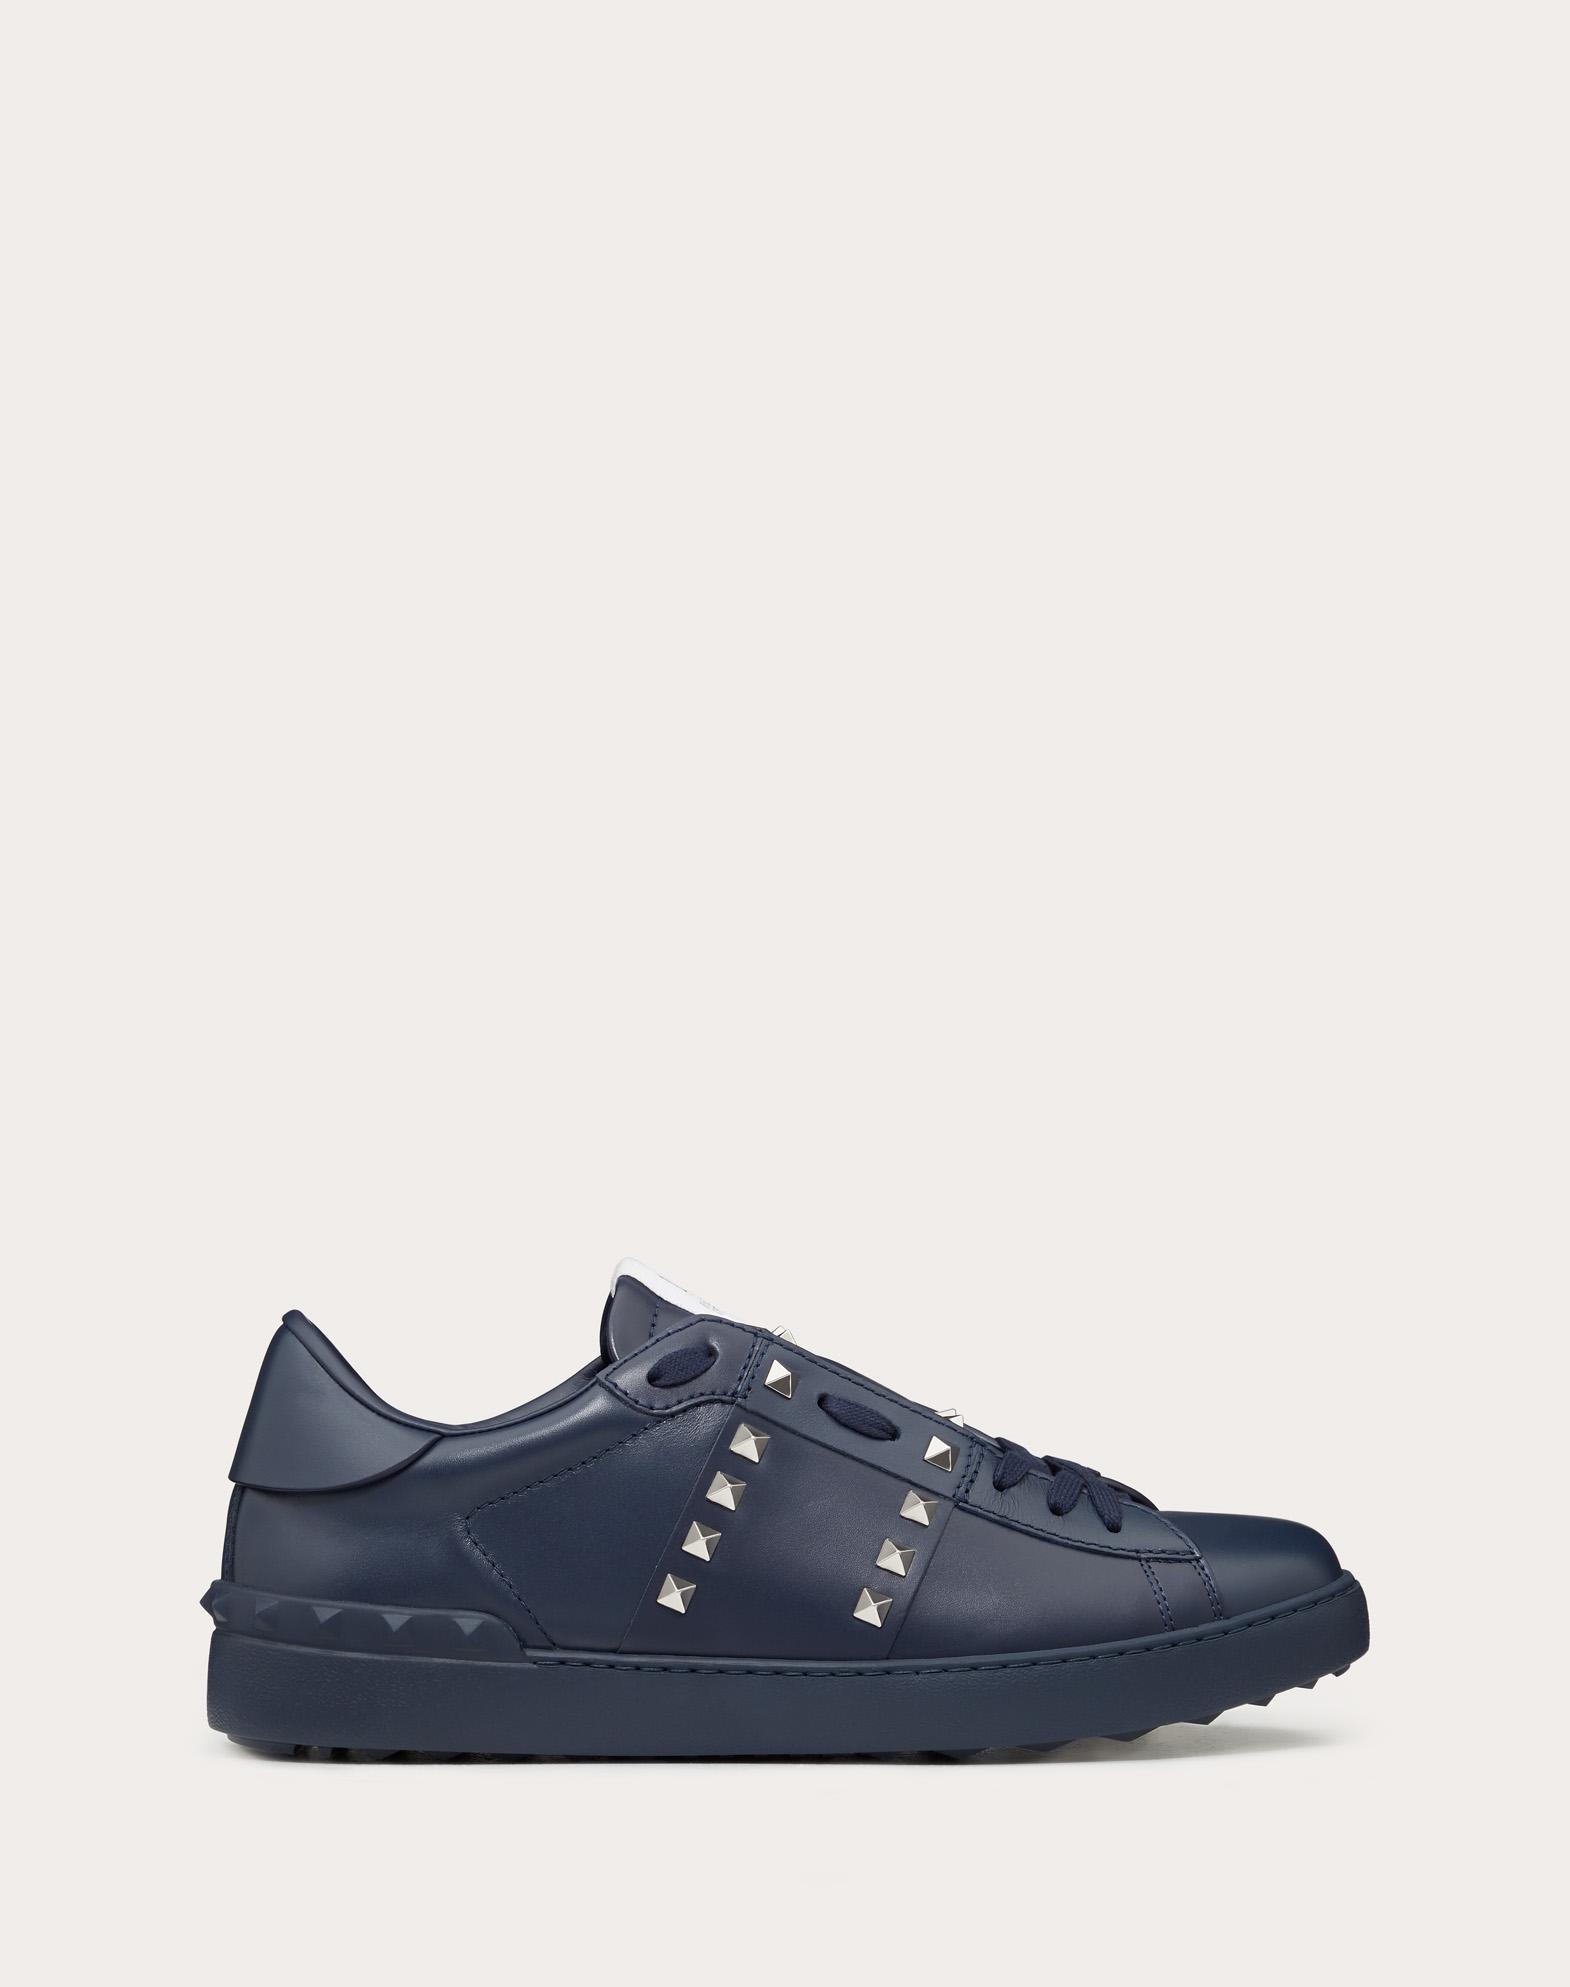 Sneakers Rockstud Untitled aus marineblauem Kalbsleder